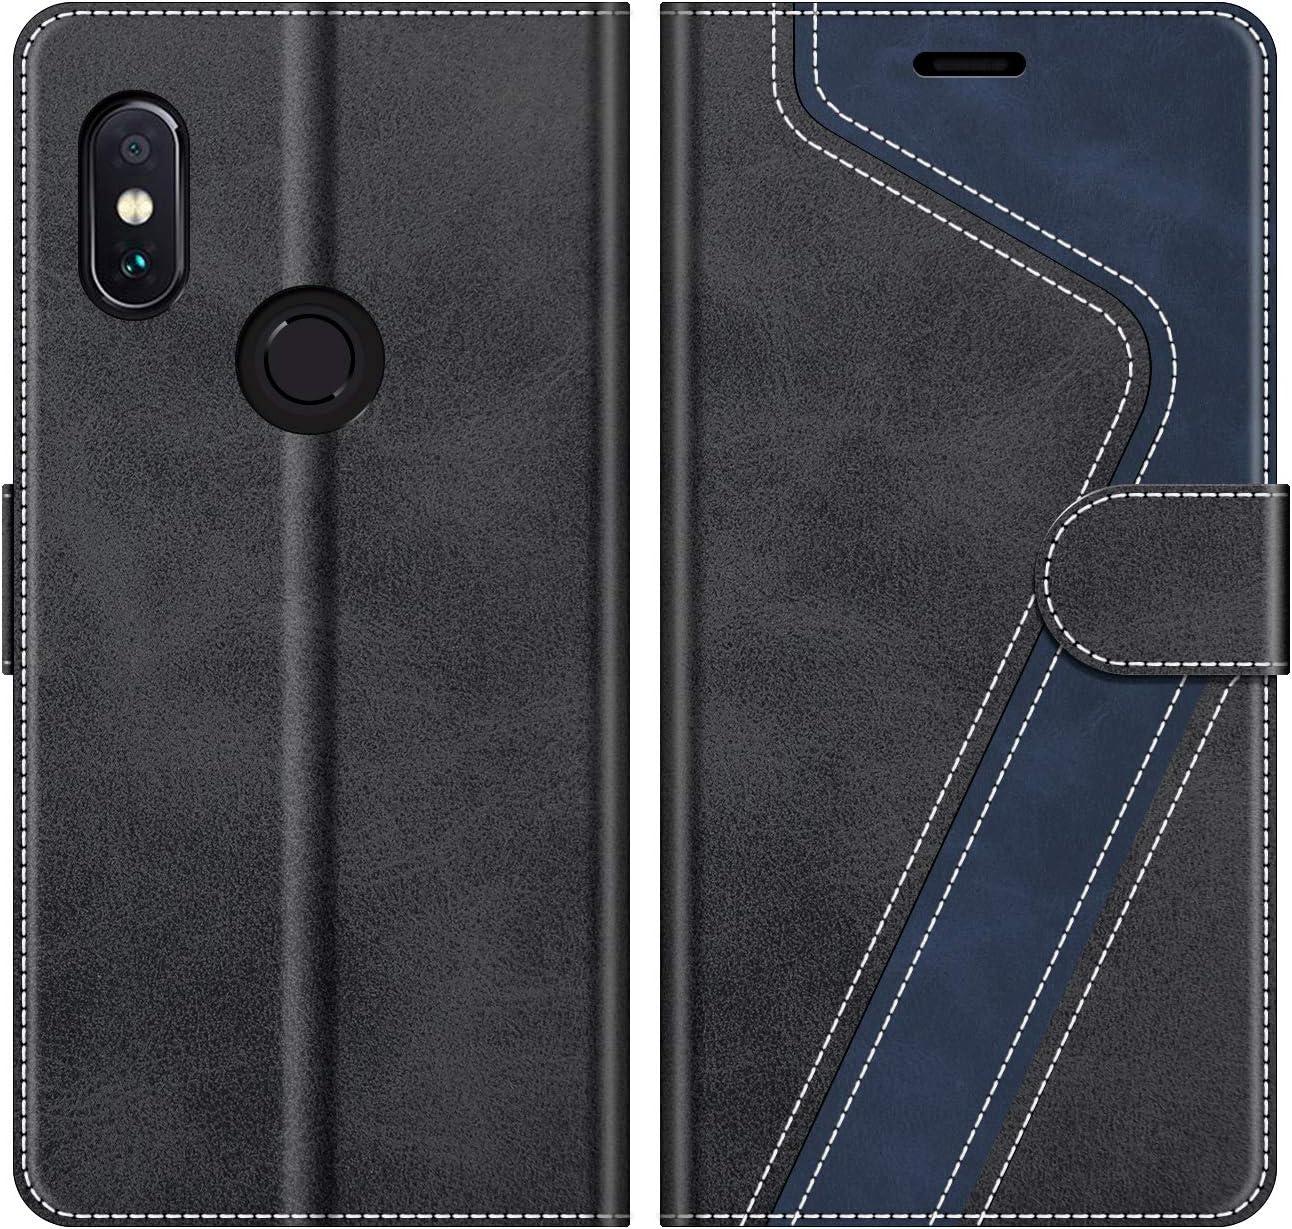 MOBESV Funda para Xiaomi Redmi Note 5, Funda Libro Xiaomi Redmi Note 5, Funda Móvil Xiaomi Redmi Note 5 Magnético Carcasa para Xiaomi Redmi Note 5 Funda con Tapa, Elegante Negro